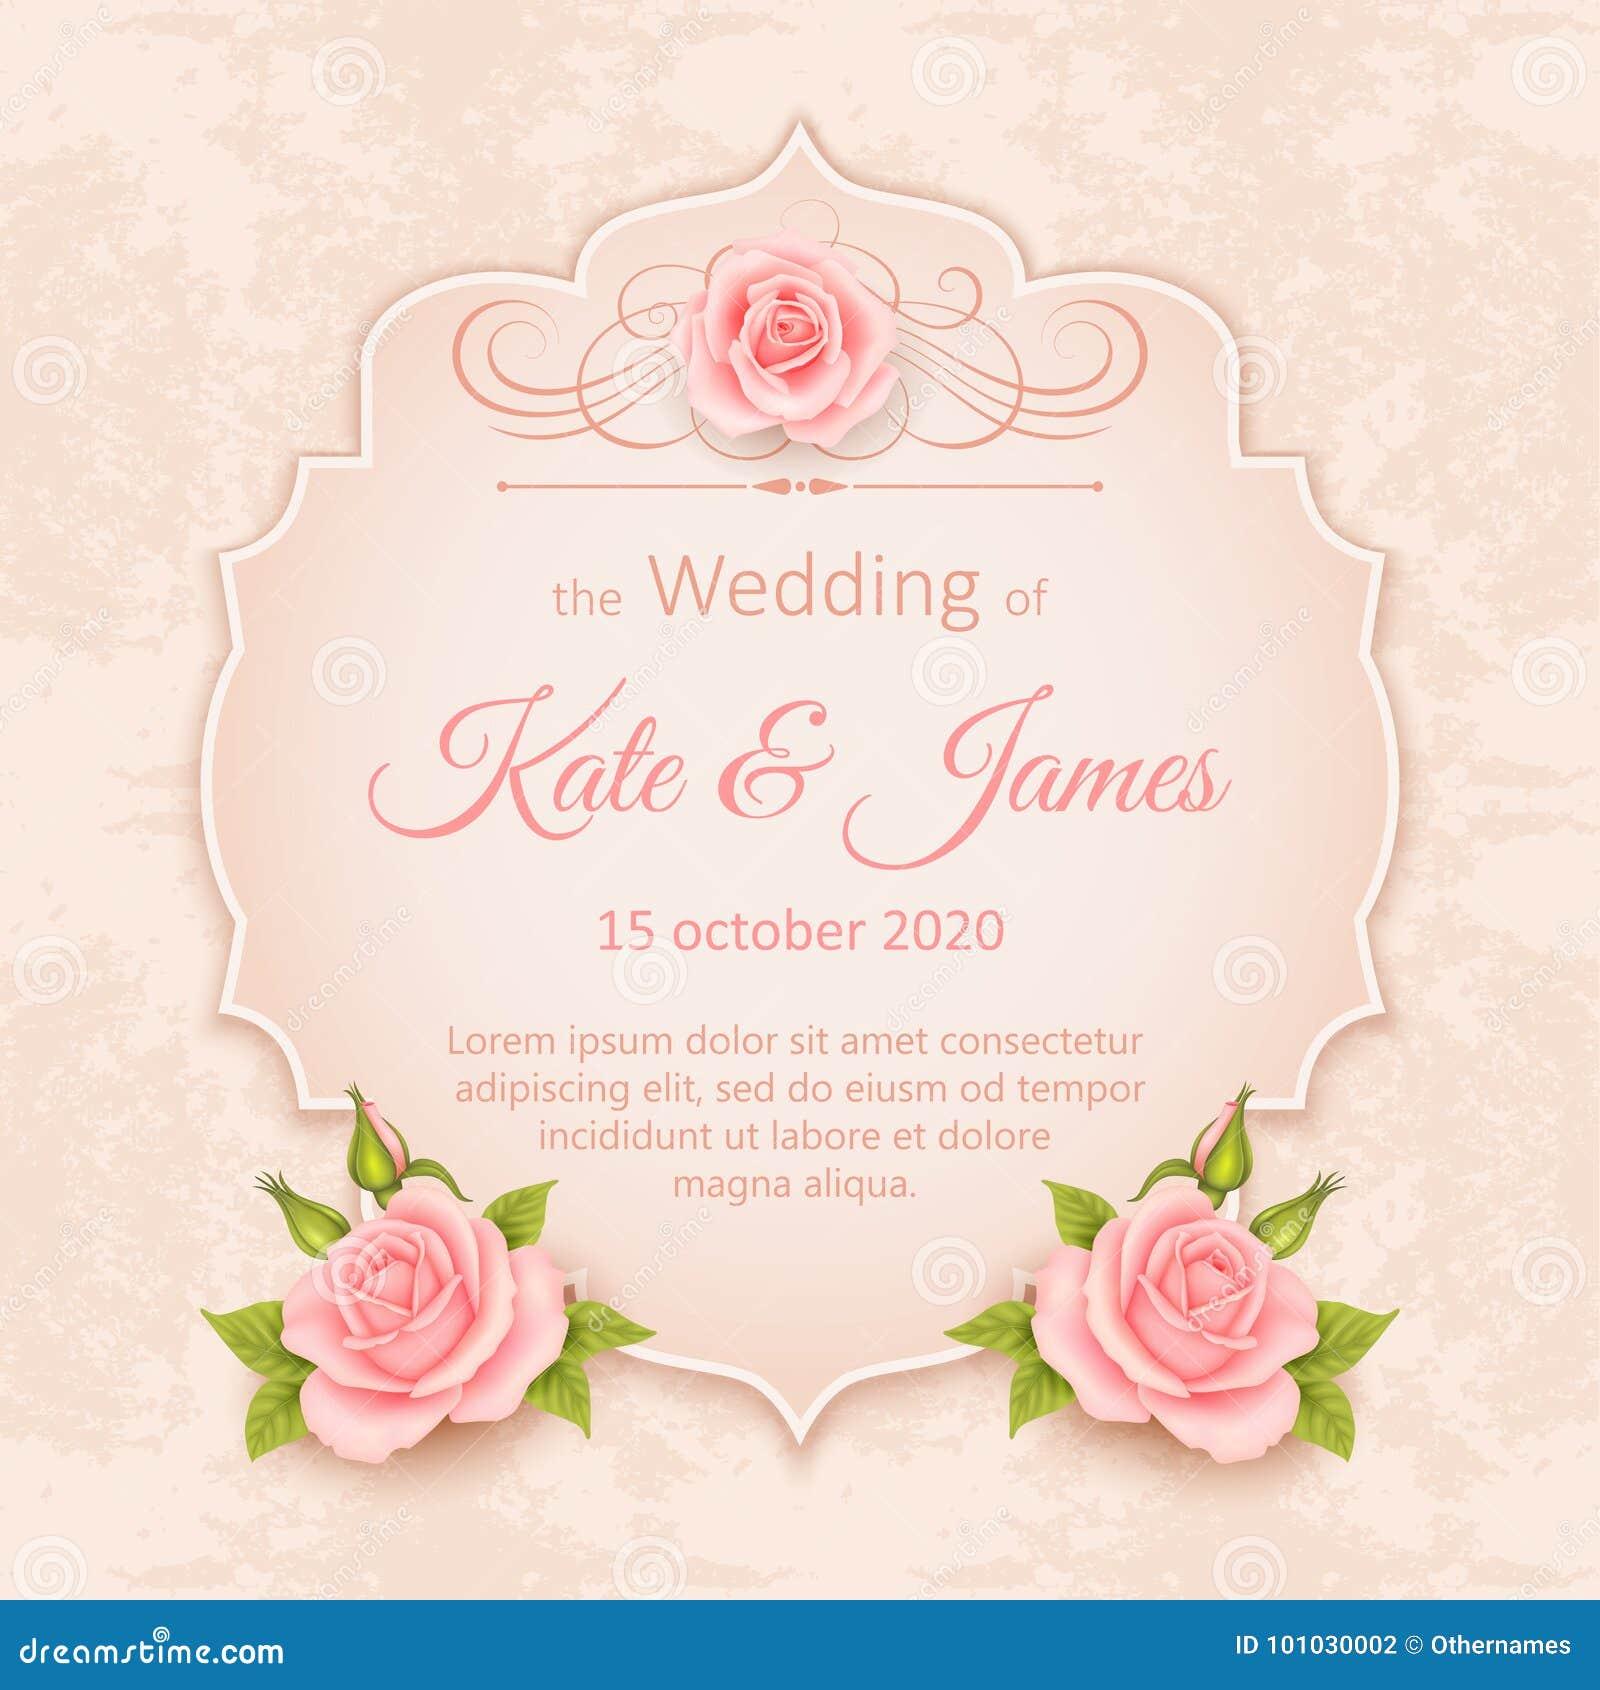 vector vintage wedding invitation with roses stock vector illustration of elegant love 101030002 dreamstime com